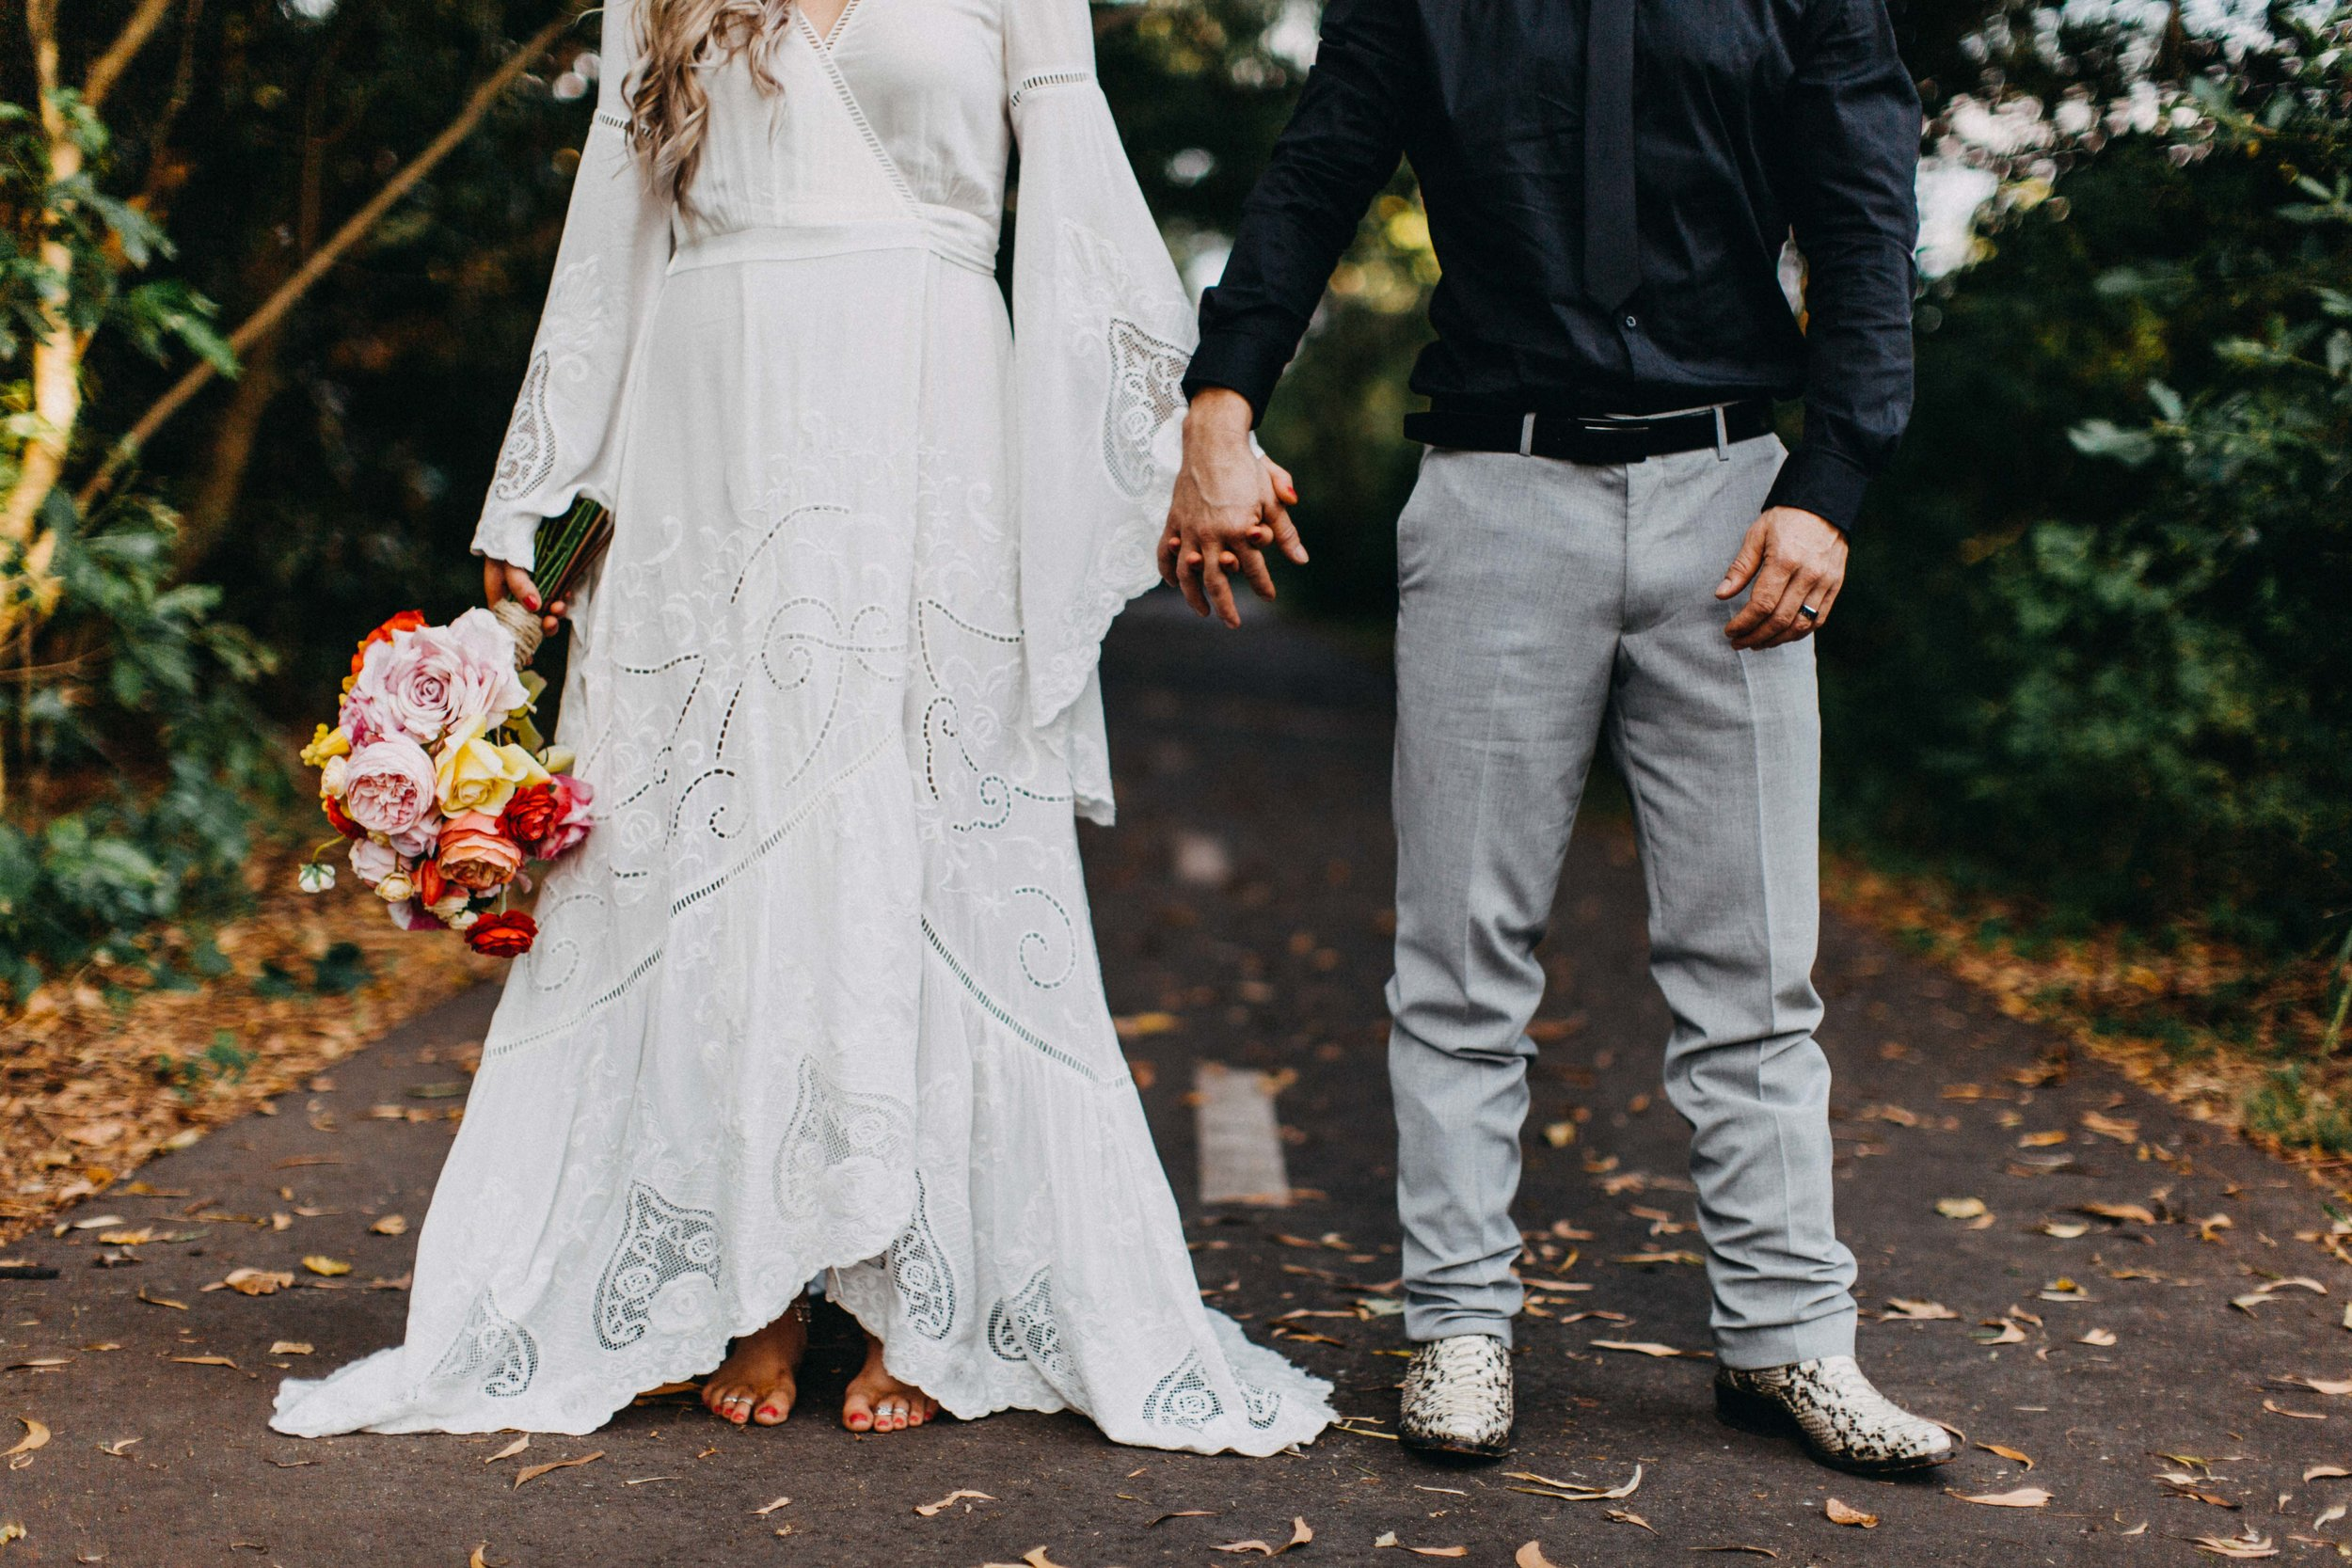 darwin-elopement-wedding-beach-camden-photography-www.emilyobrienphotography.net-59.jpg